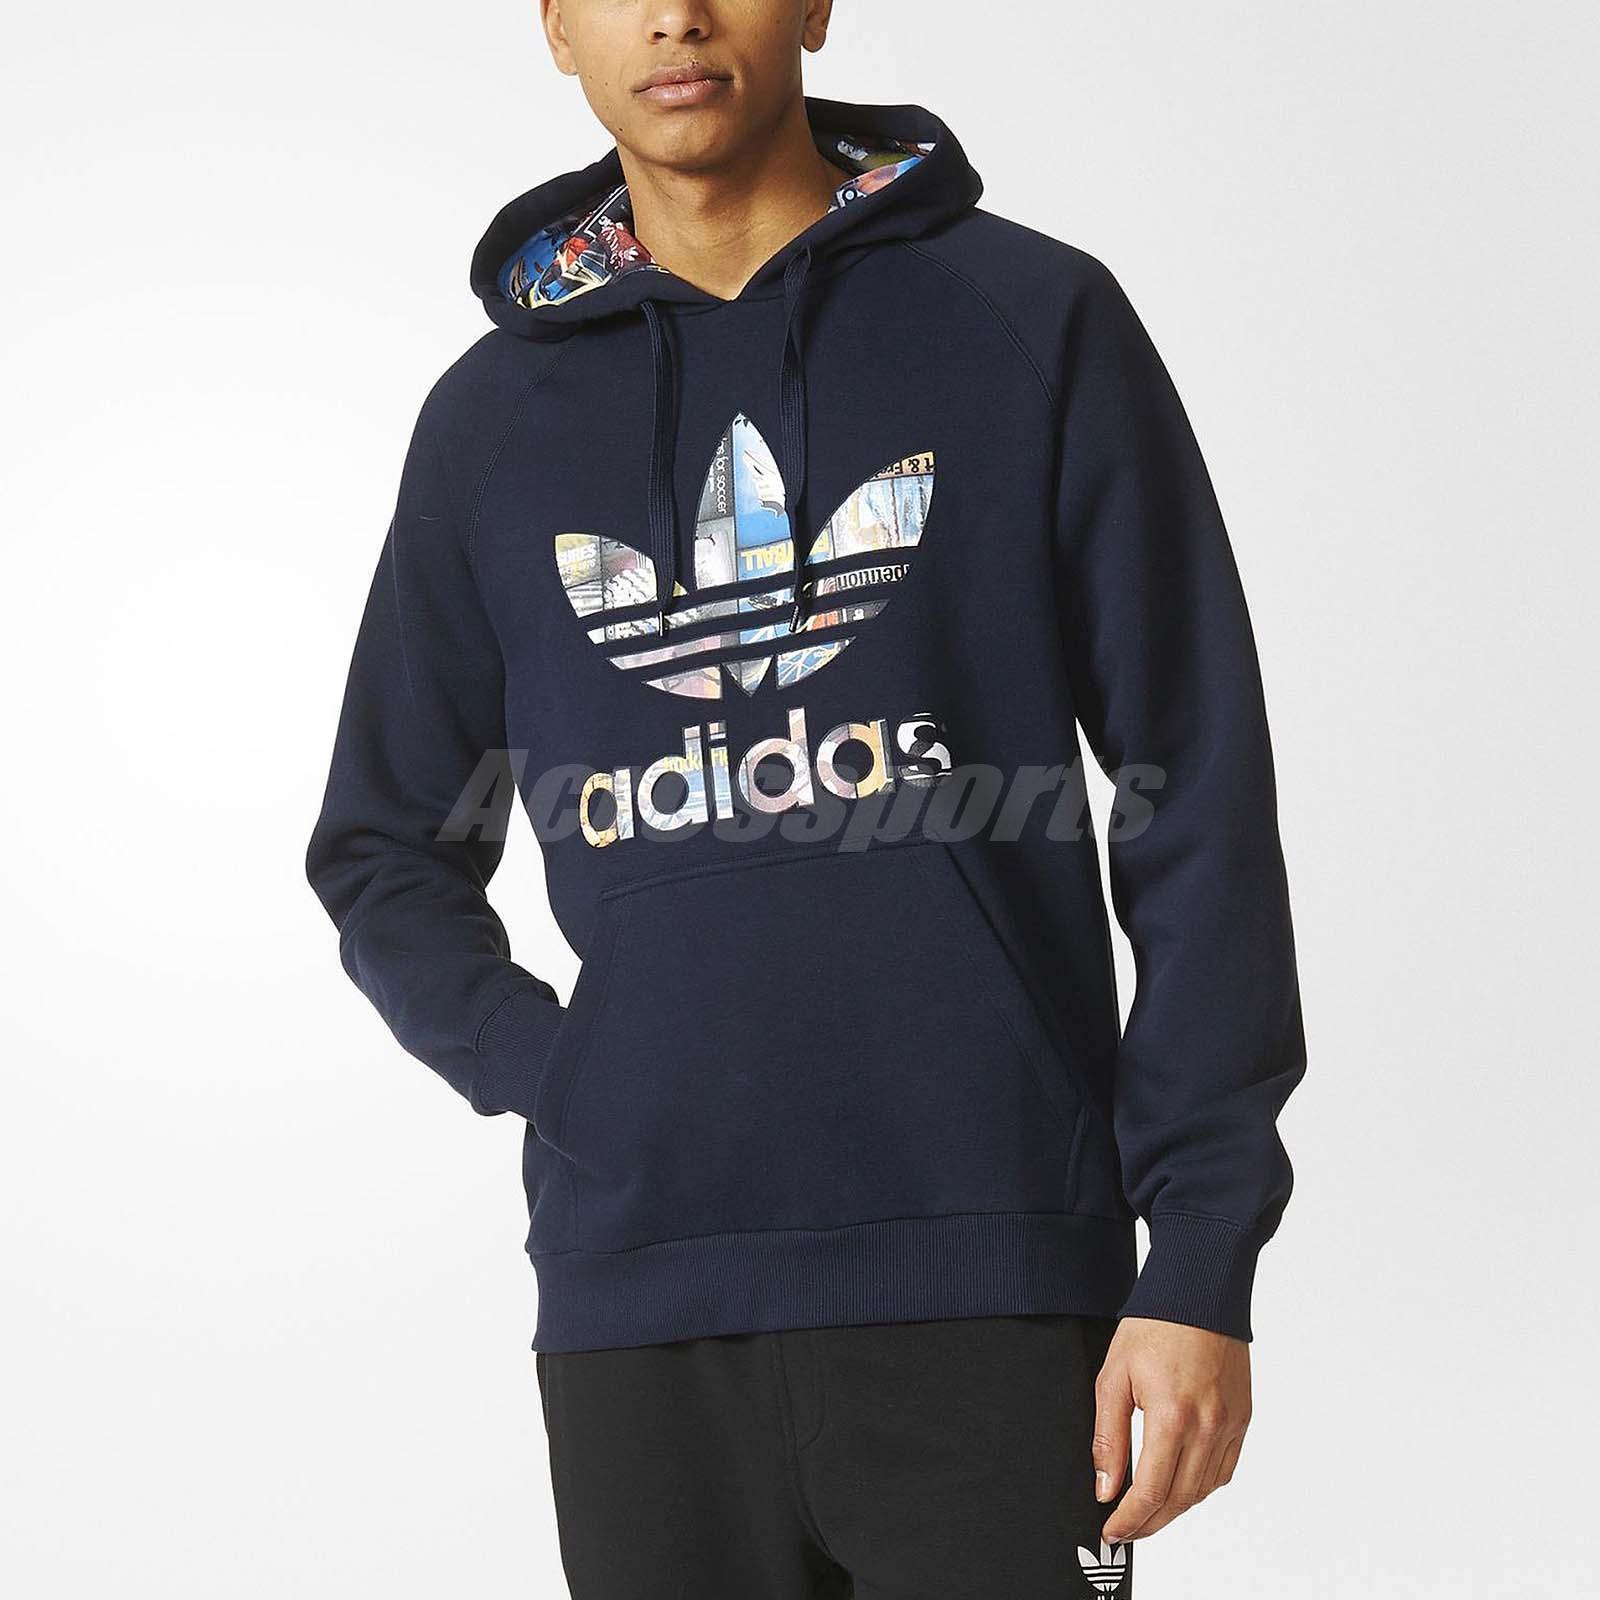 adidas originals men back to school hoodie pullover navy. Black Bedroom Furniture Sets. Home Design Ideas